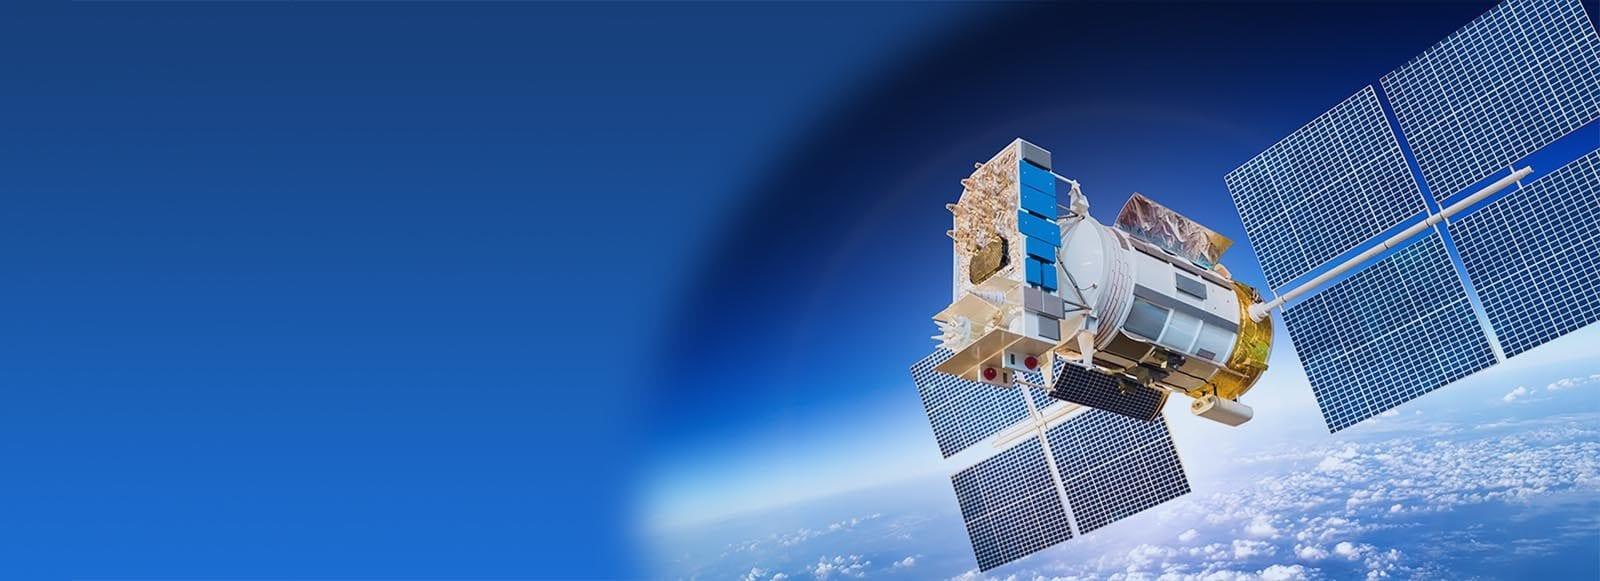 satellite slide